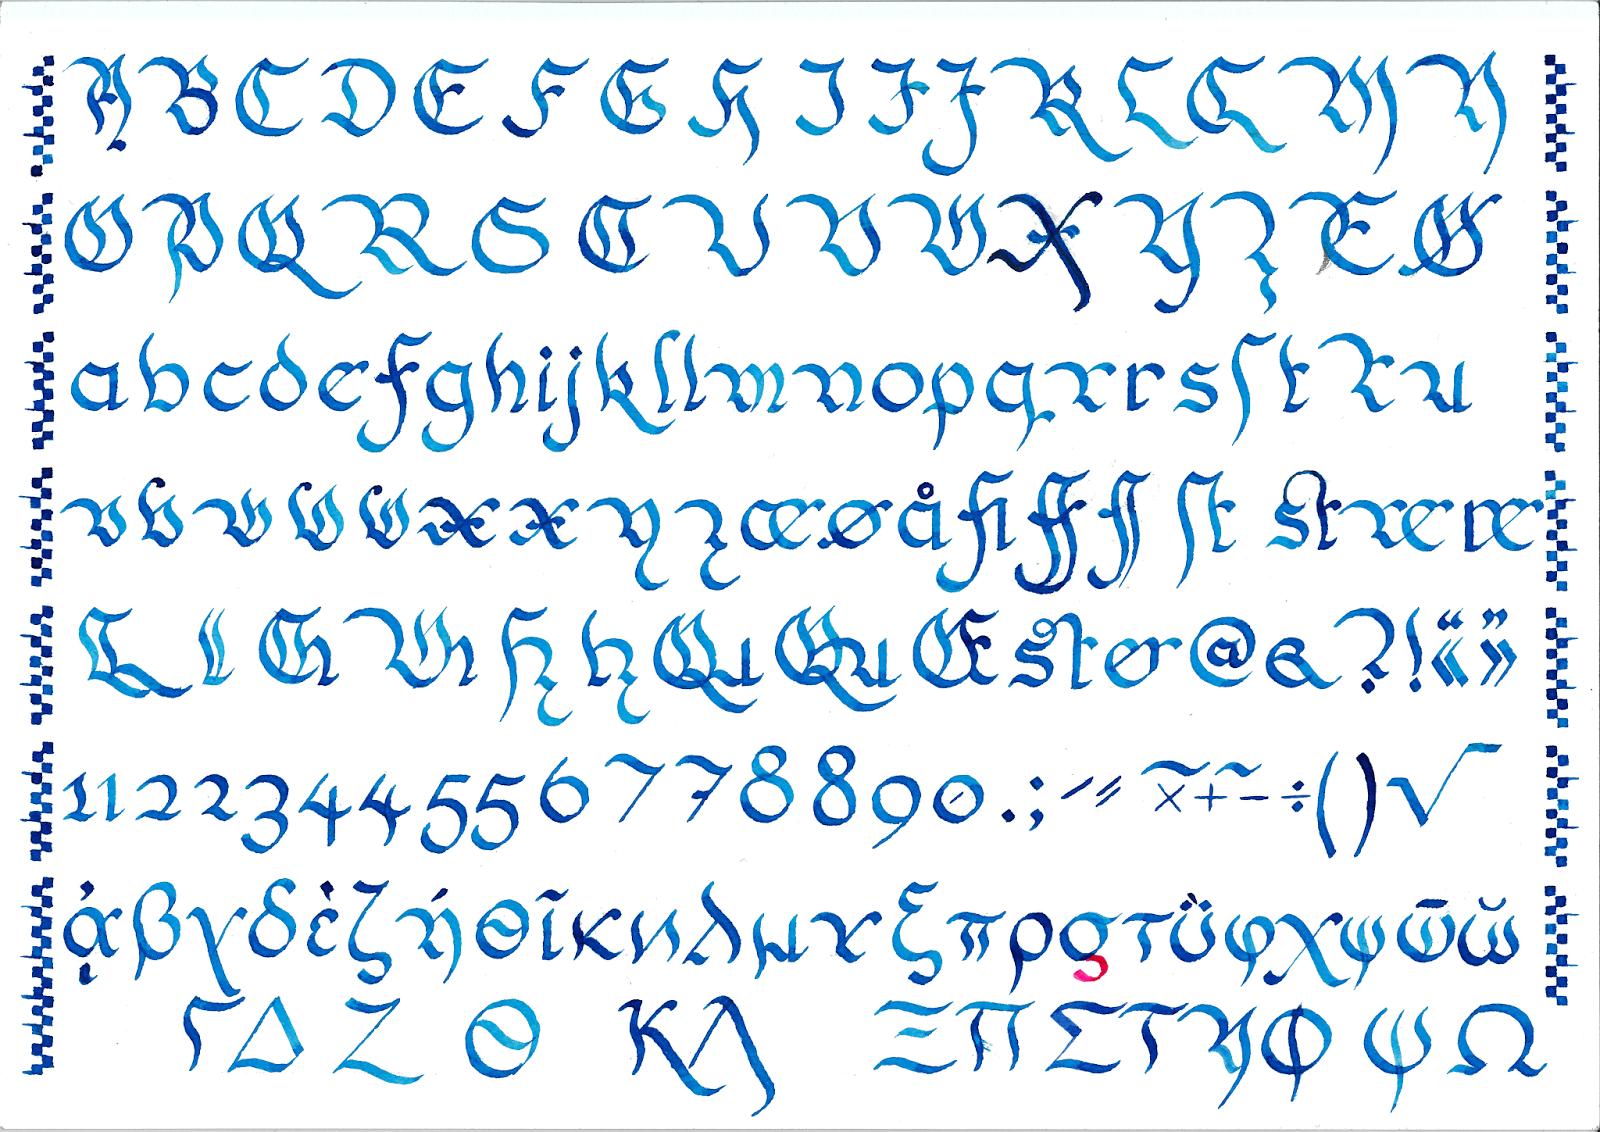 Schwabacher mollis, skrift utformet av Tor-Ivar Krogsæter, februar 2016.